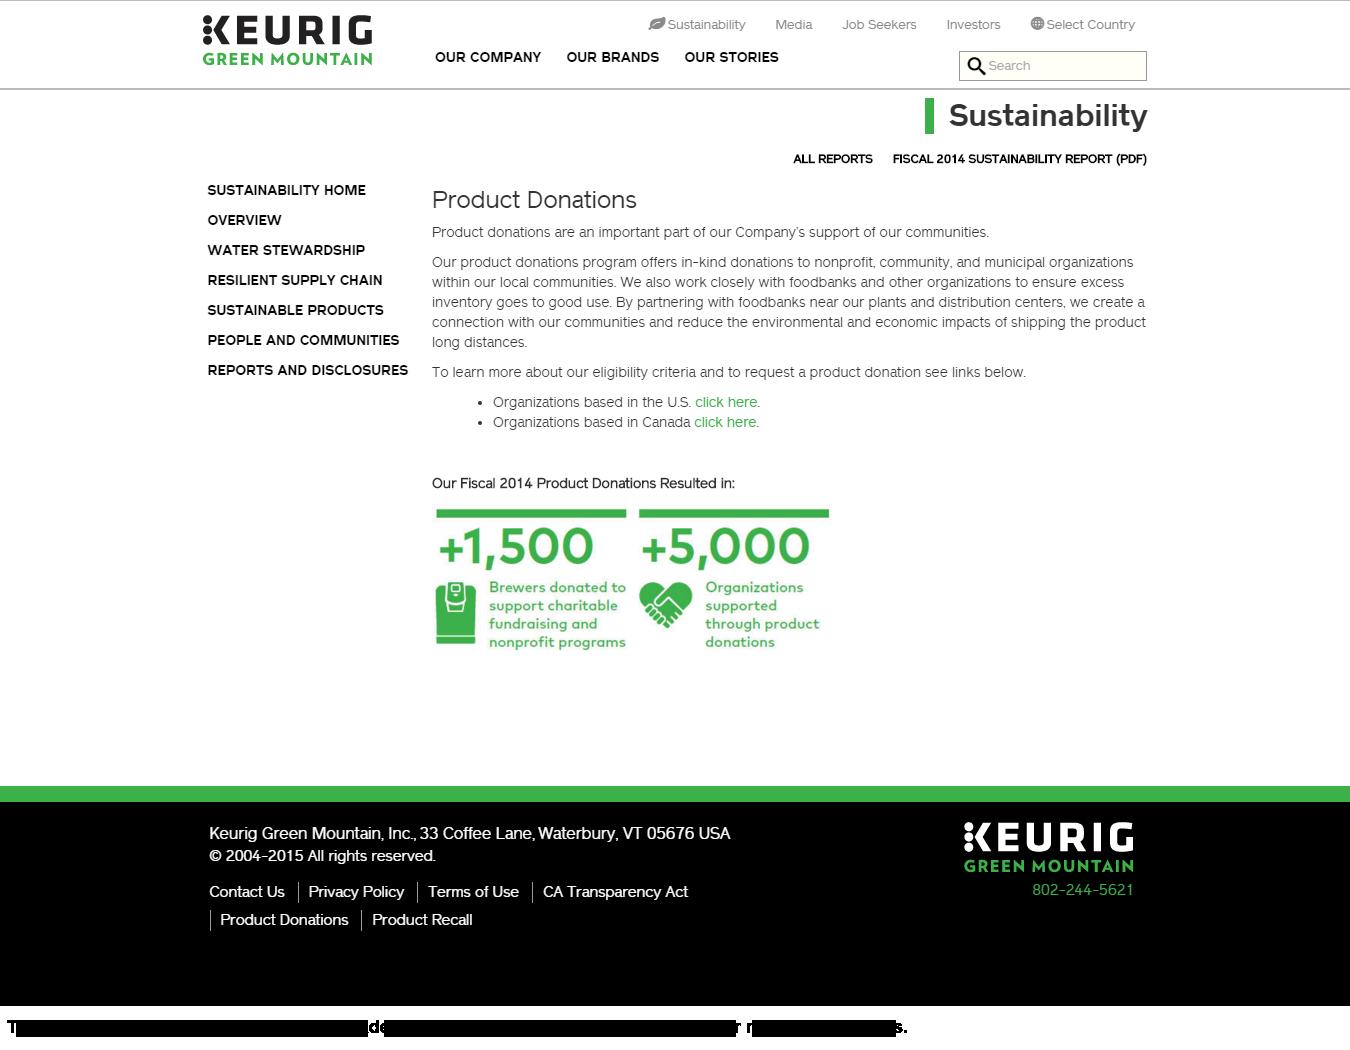 Keurig Green Mountain donation info and form. http://www.keuriggreenmountain.com